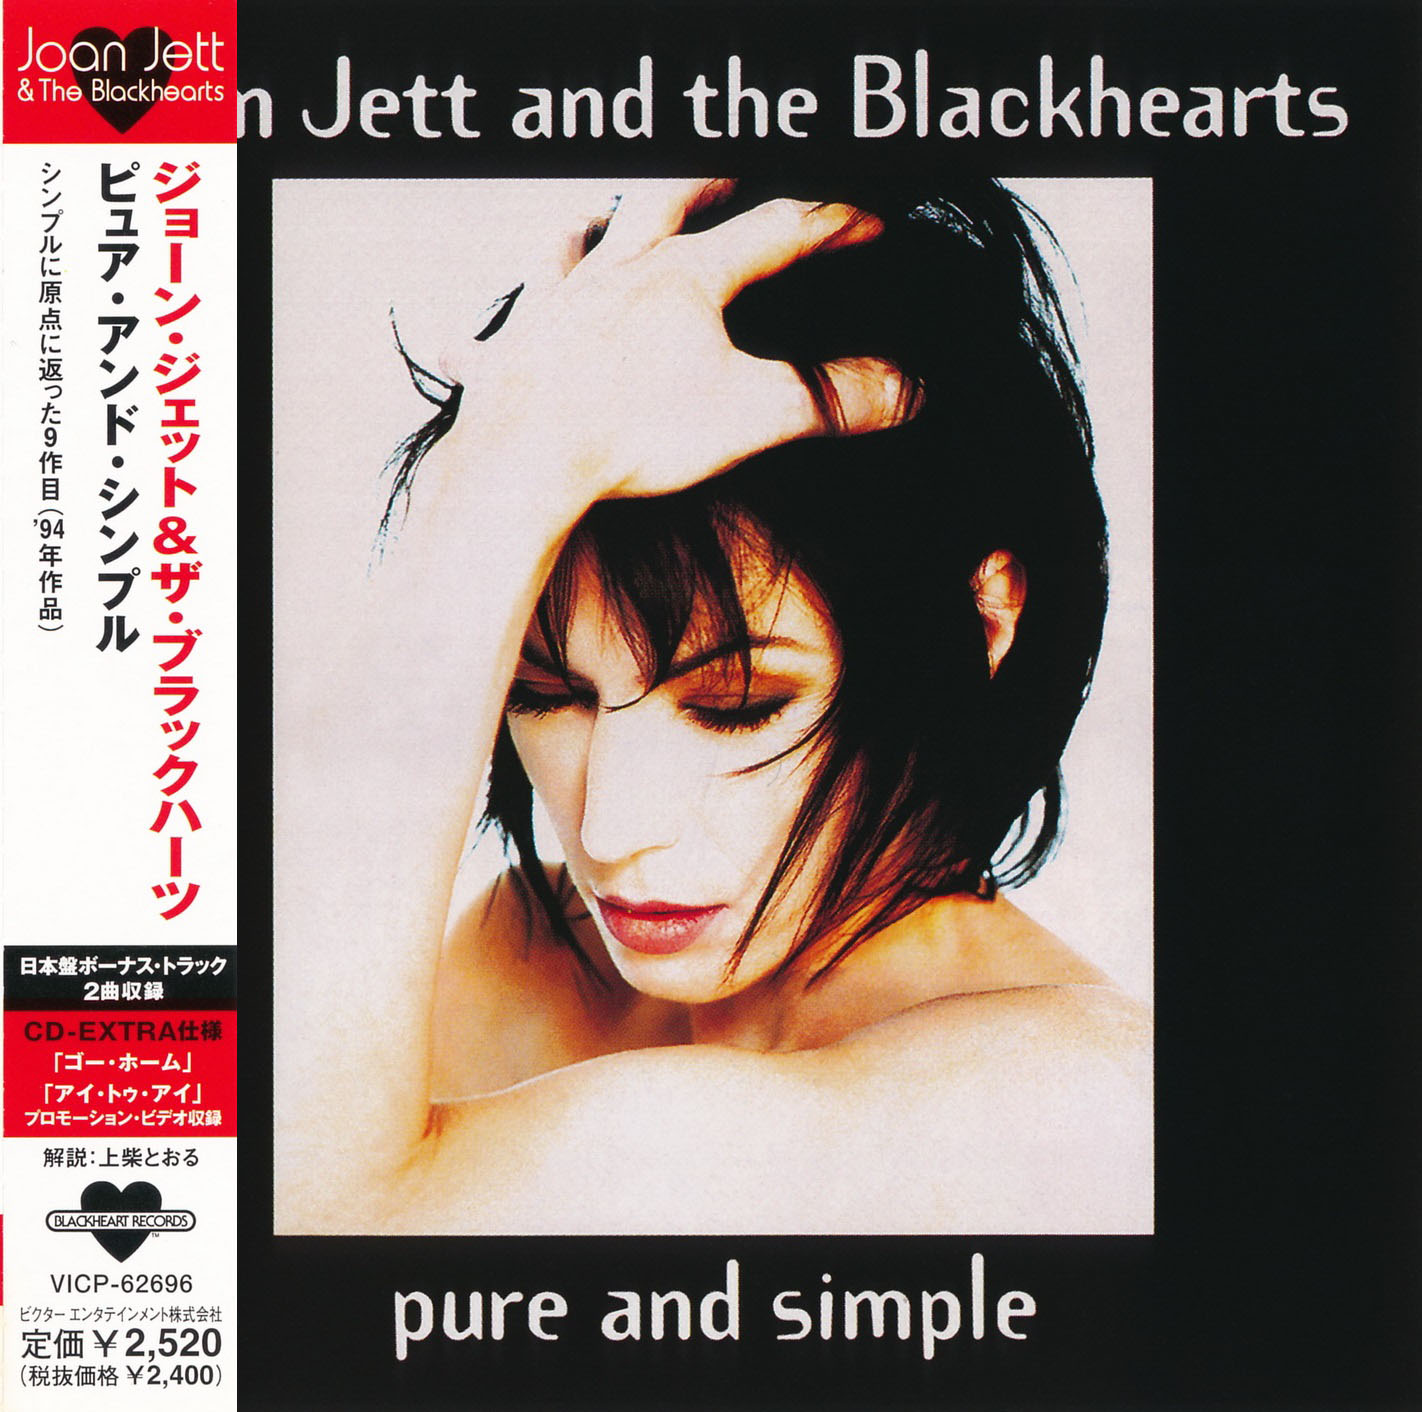 MUSICAS BLACKHEARTS BAIXAR DE THE JETT JOAN &